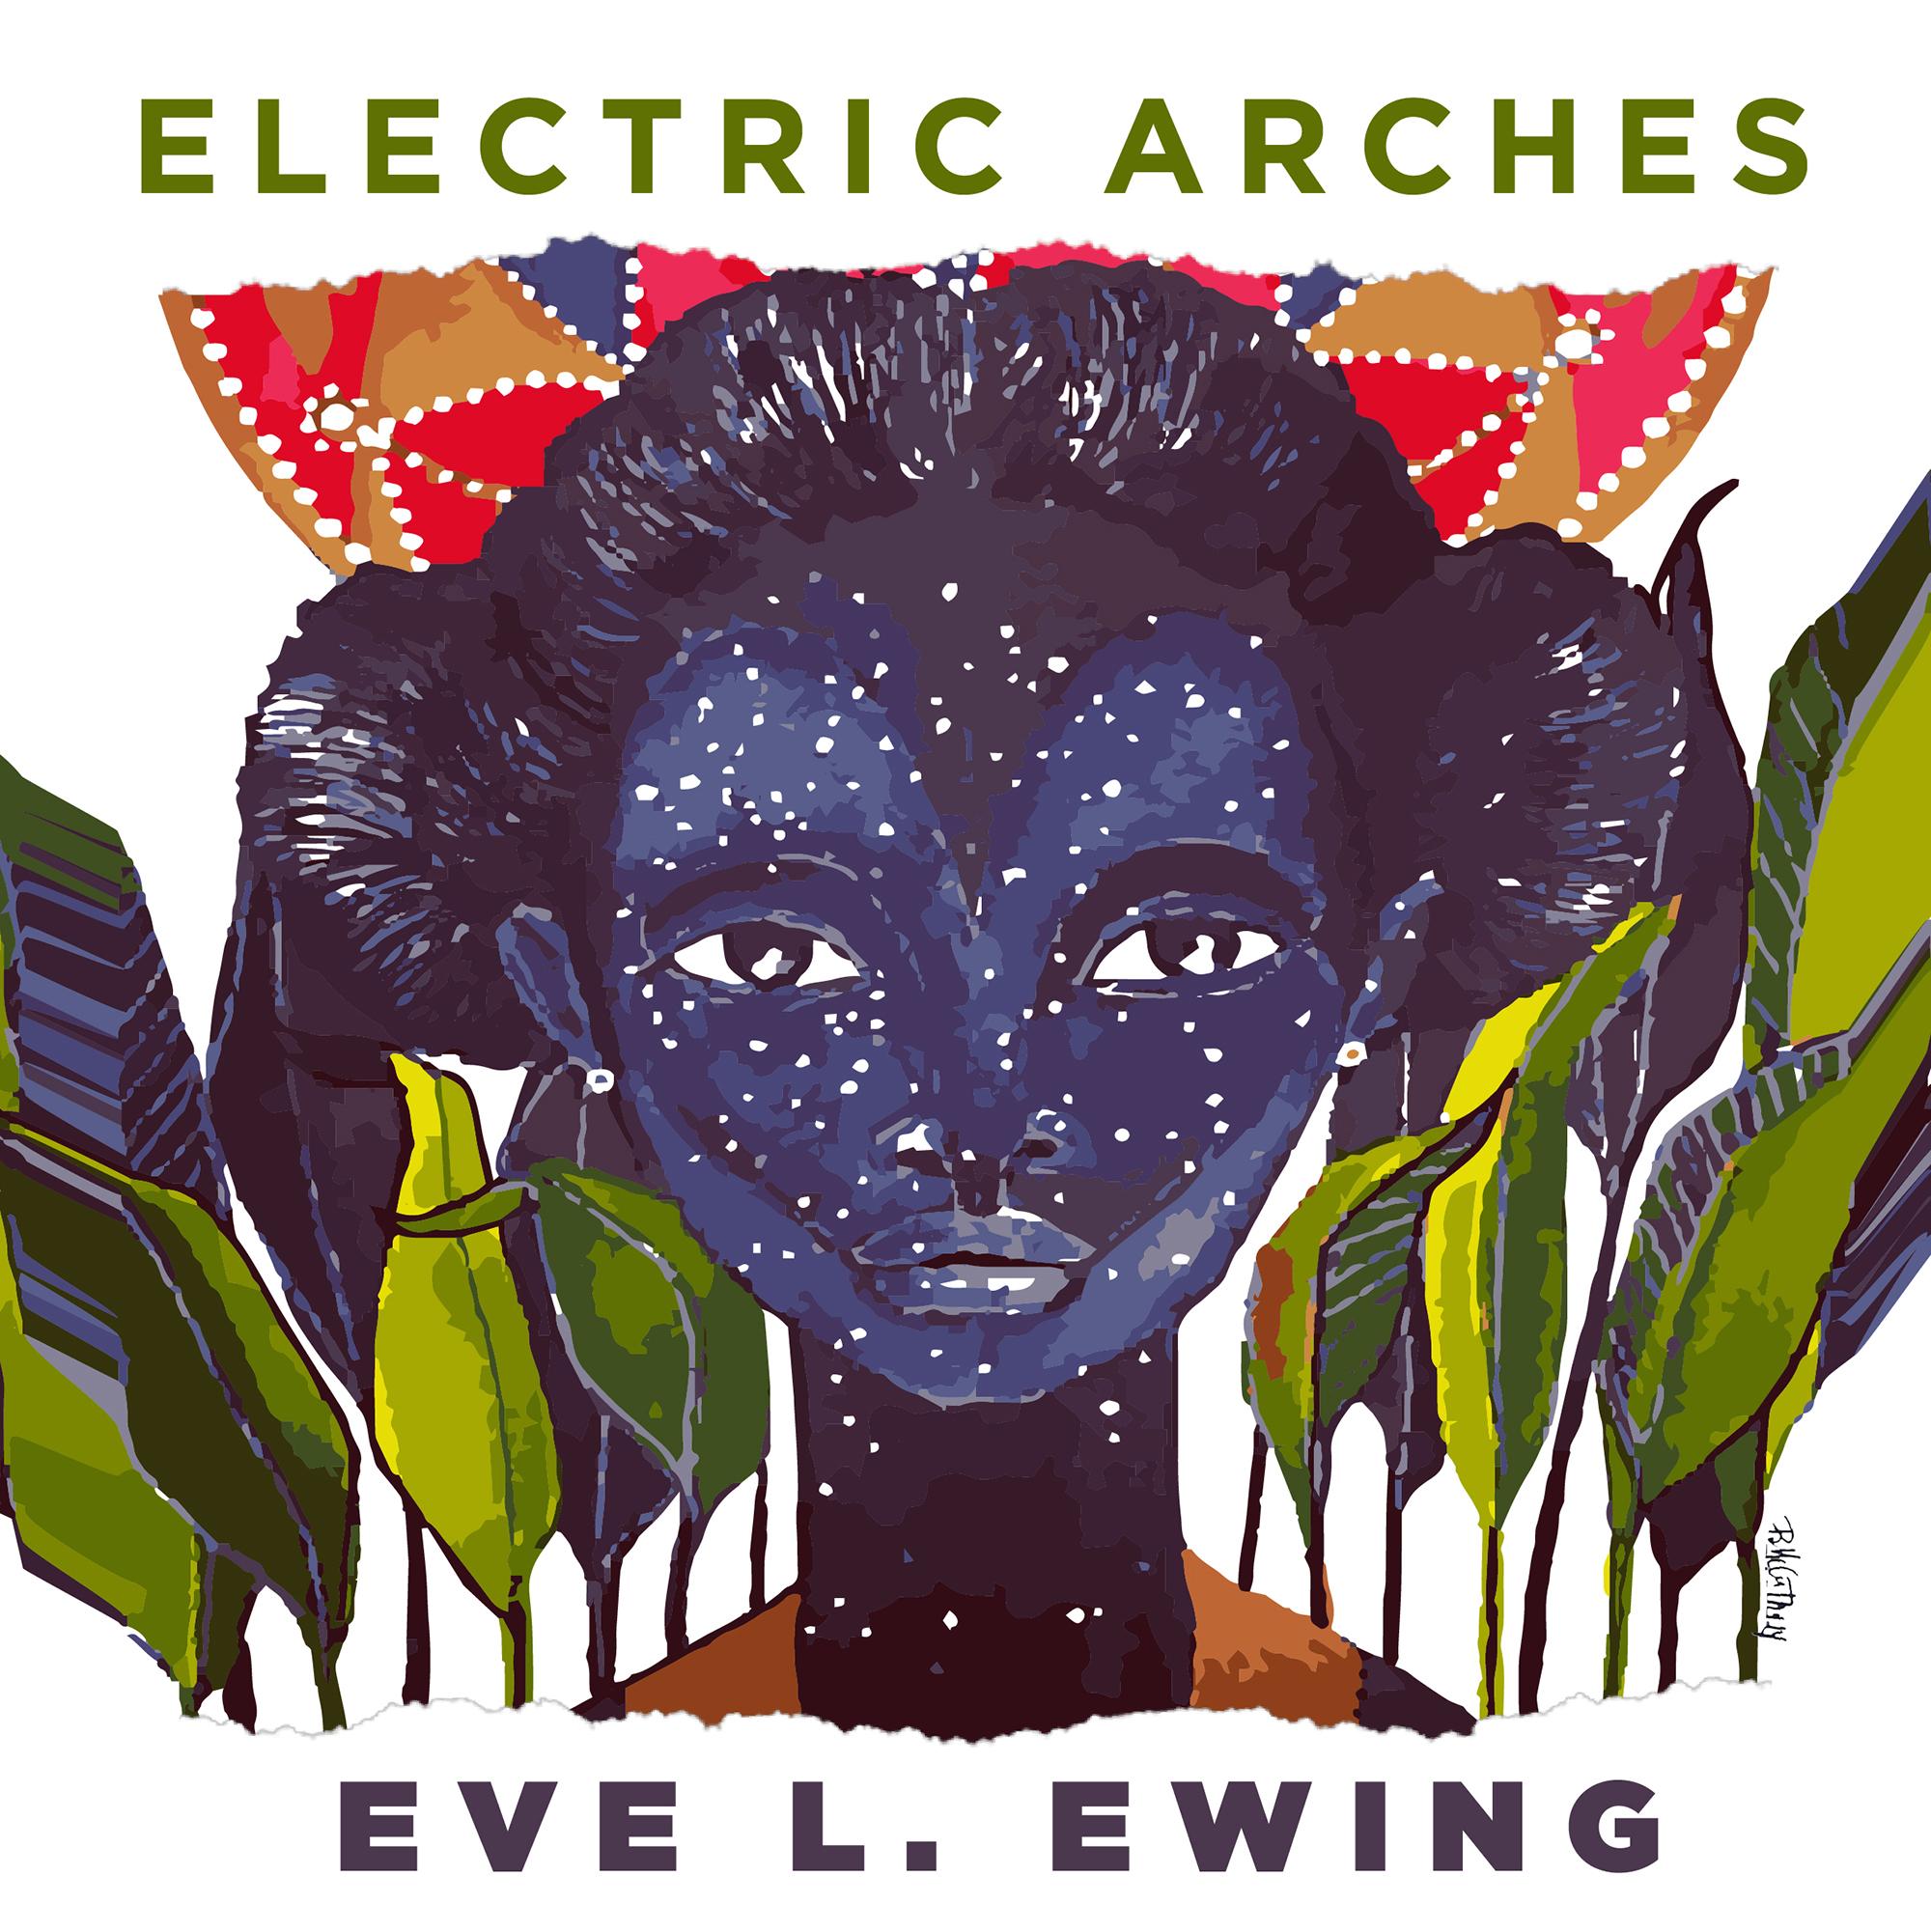 eveewingPIC6.jpg